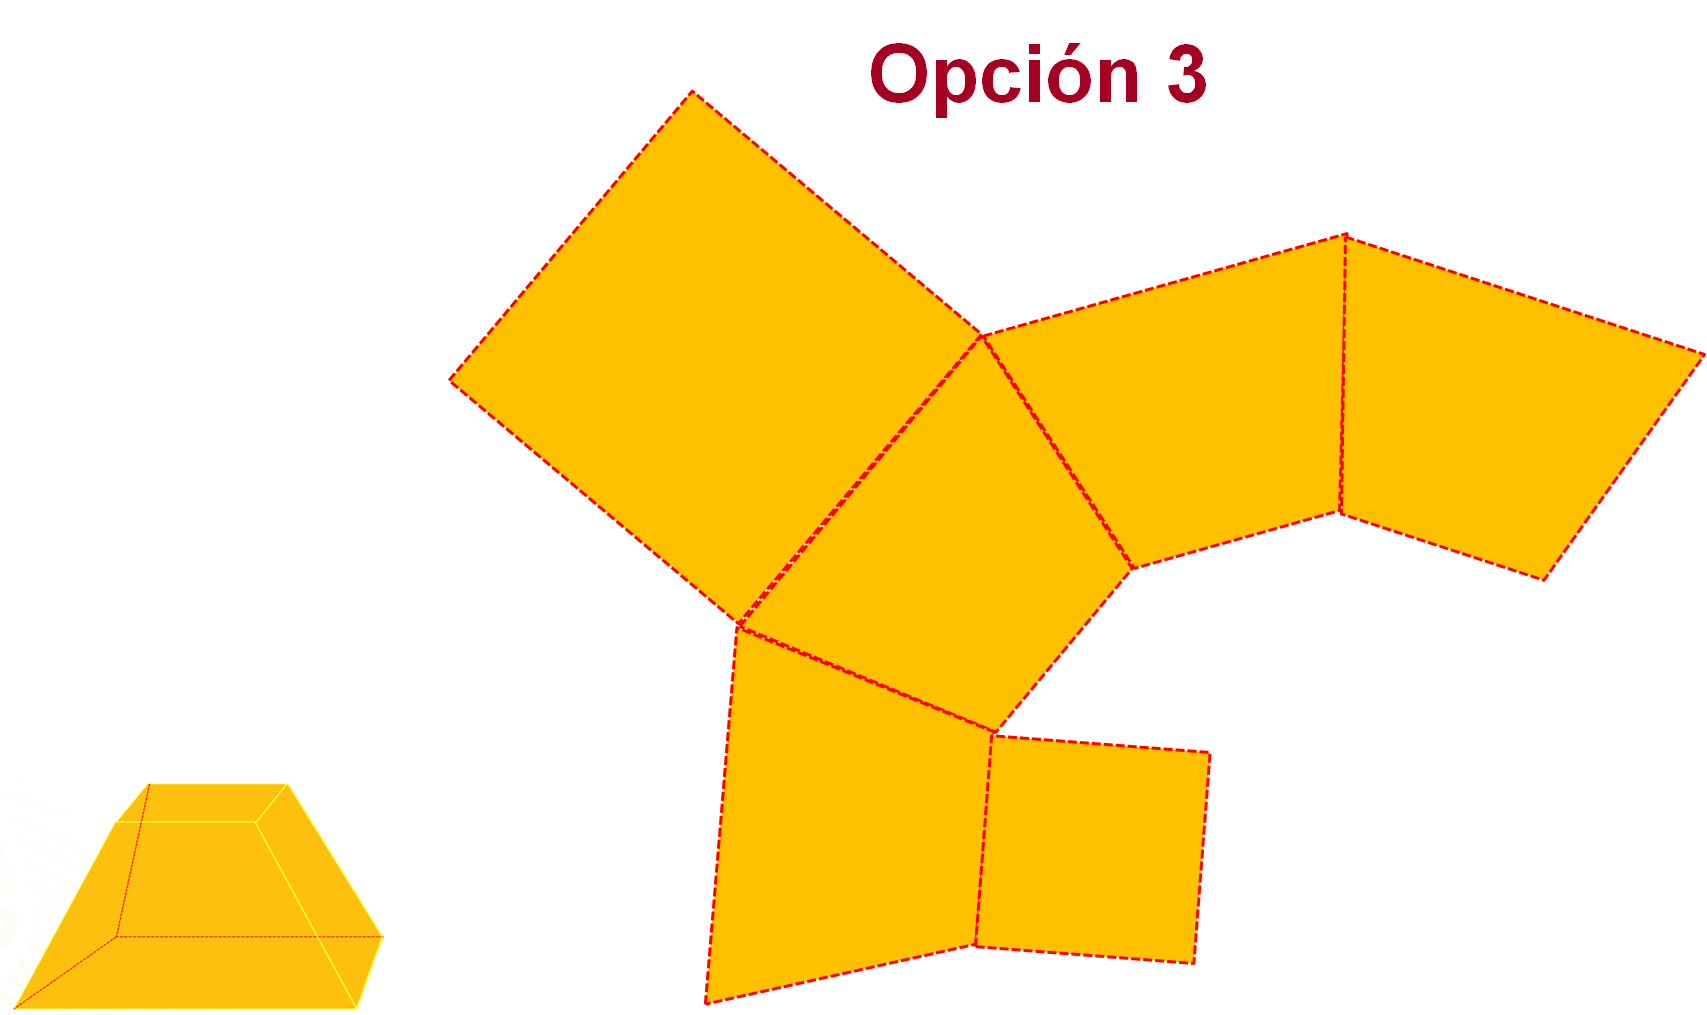 B64 IMG K2nGAIYitV CU0Bs74rC3